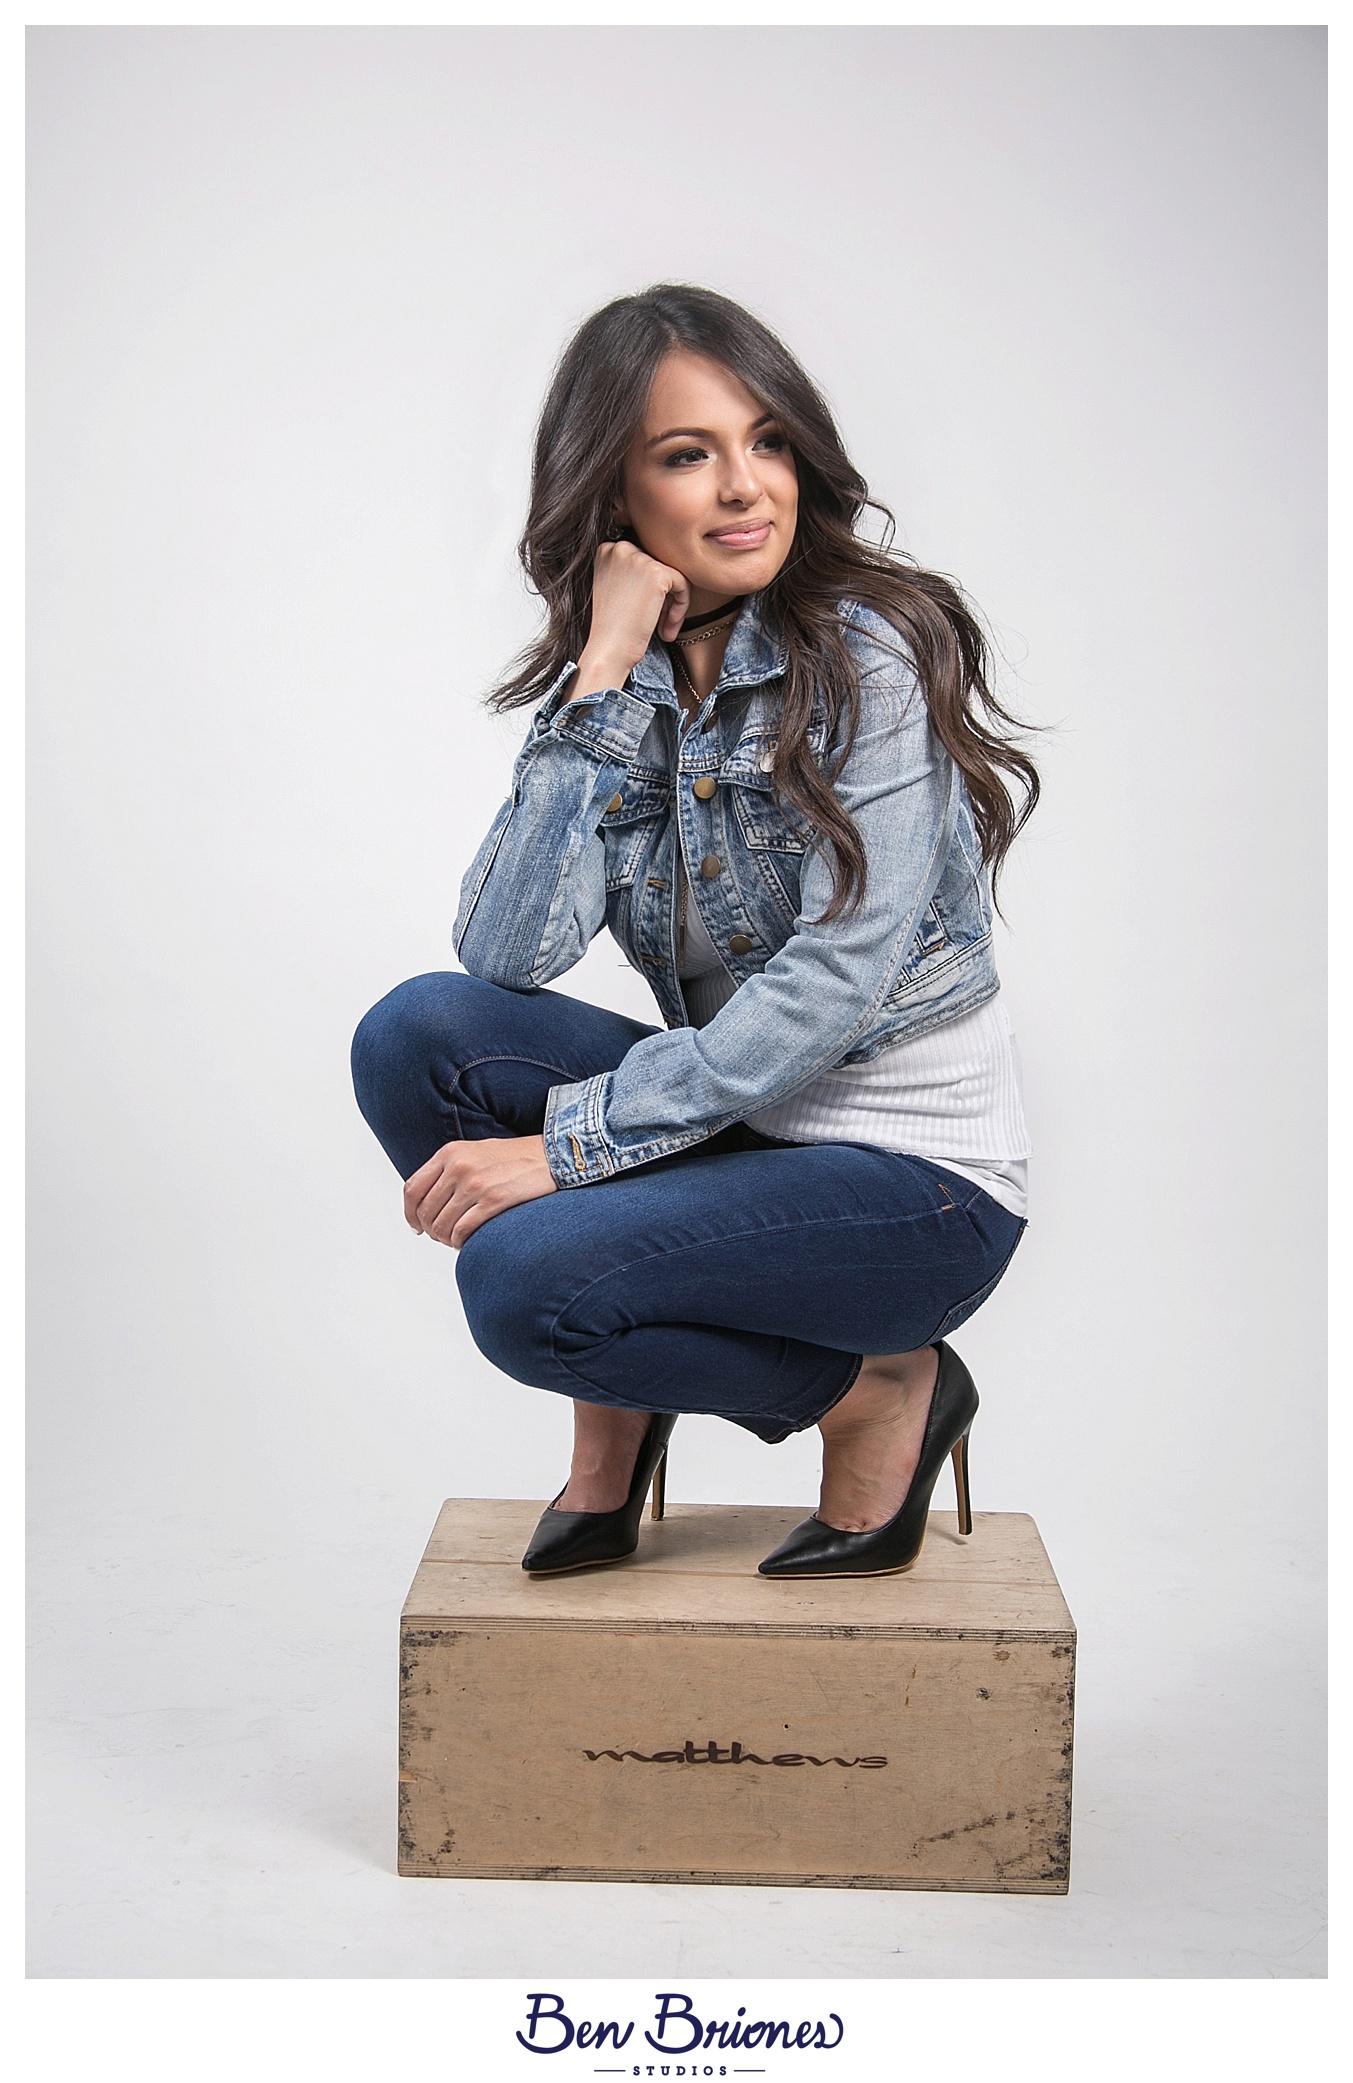 08.12.17_PRINT_Georgette Rojas Portraits_BBS-4936_pp_BLOG